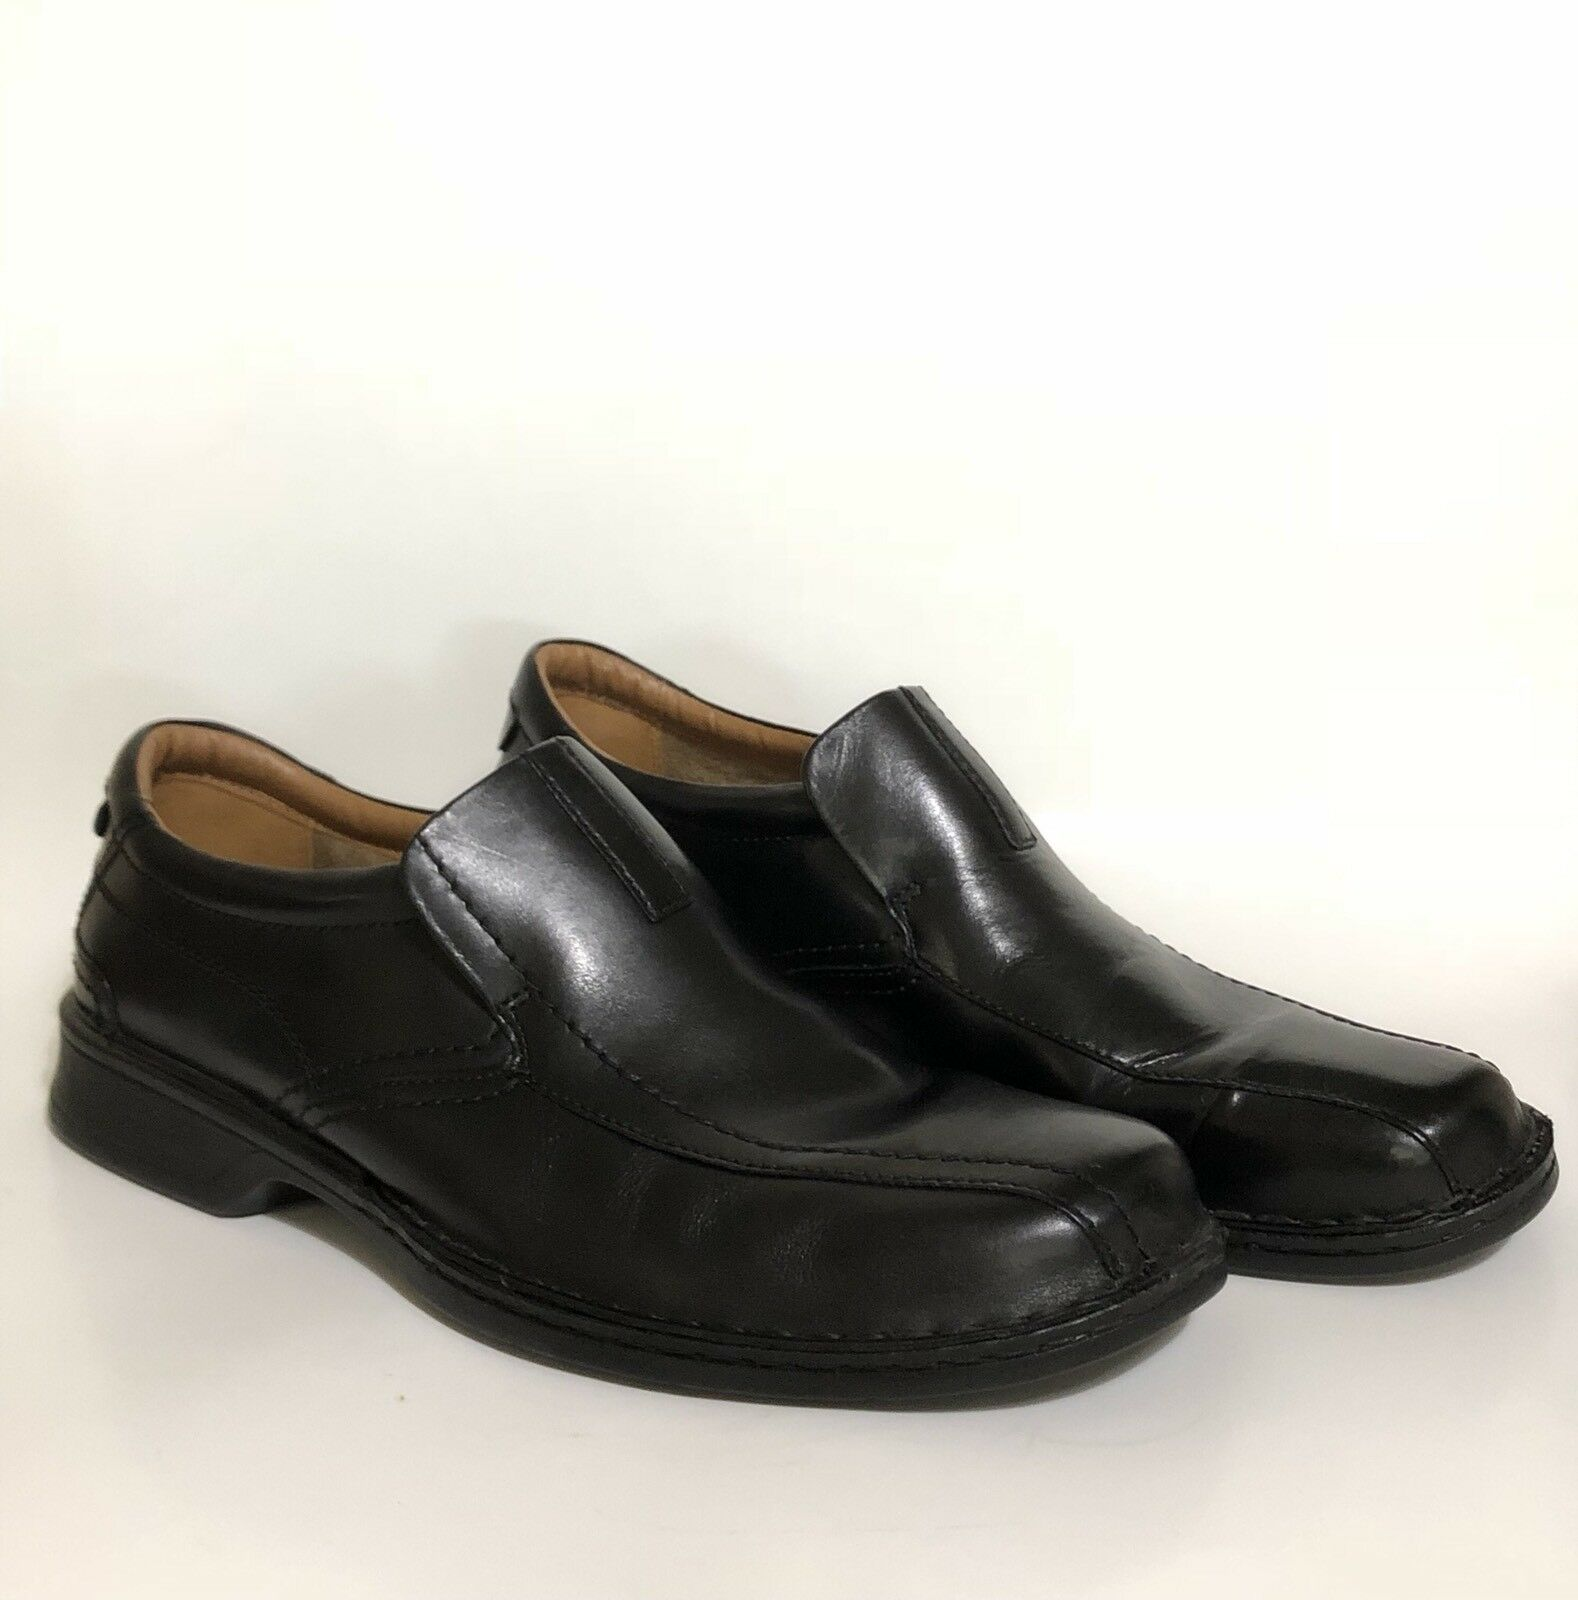 Clarks Escalade Step Slip On Loafers Leather Black Ortholite Cushion Size 13 M